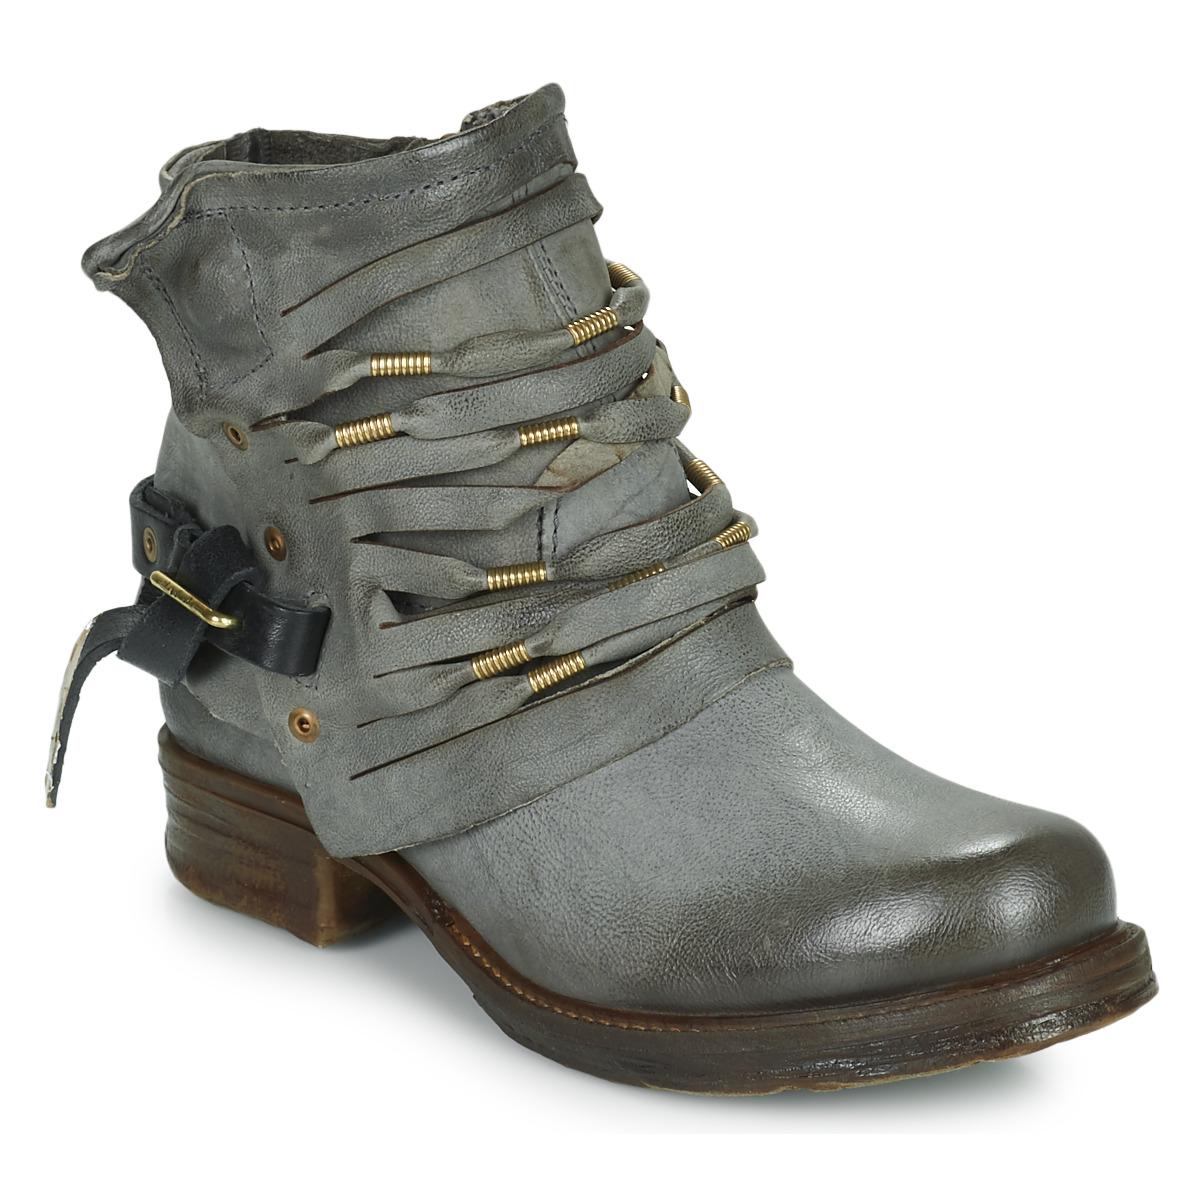 7934a91d09d Chaussures Femme Boots Airstep   A.S.98 SAINT Noir fumé